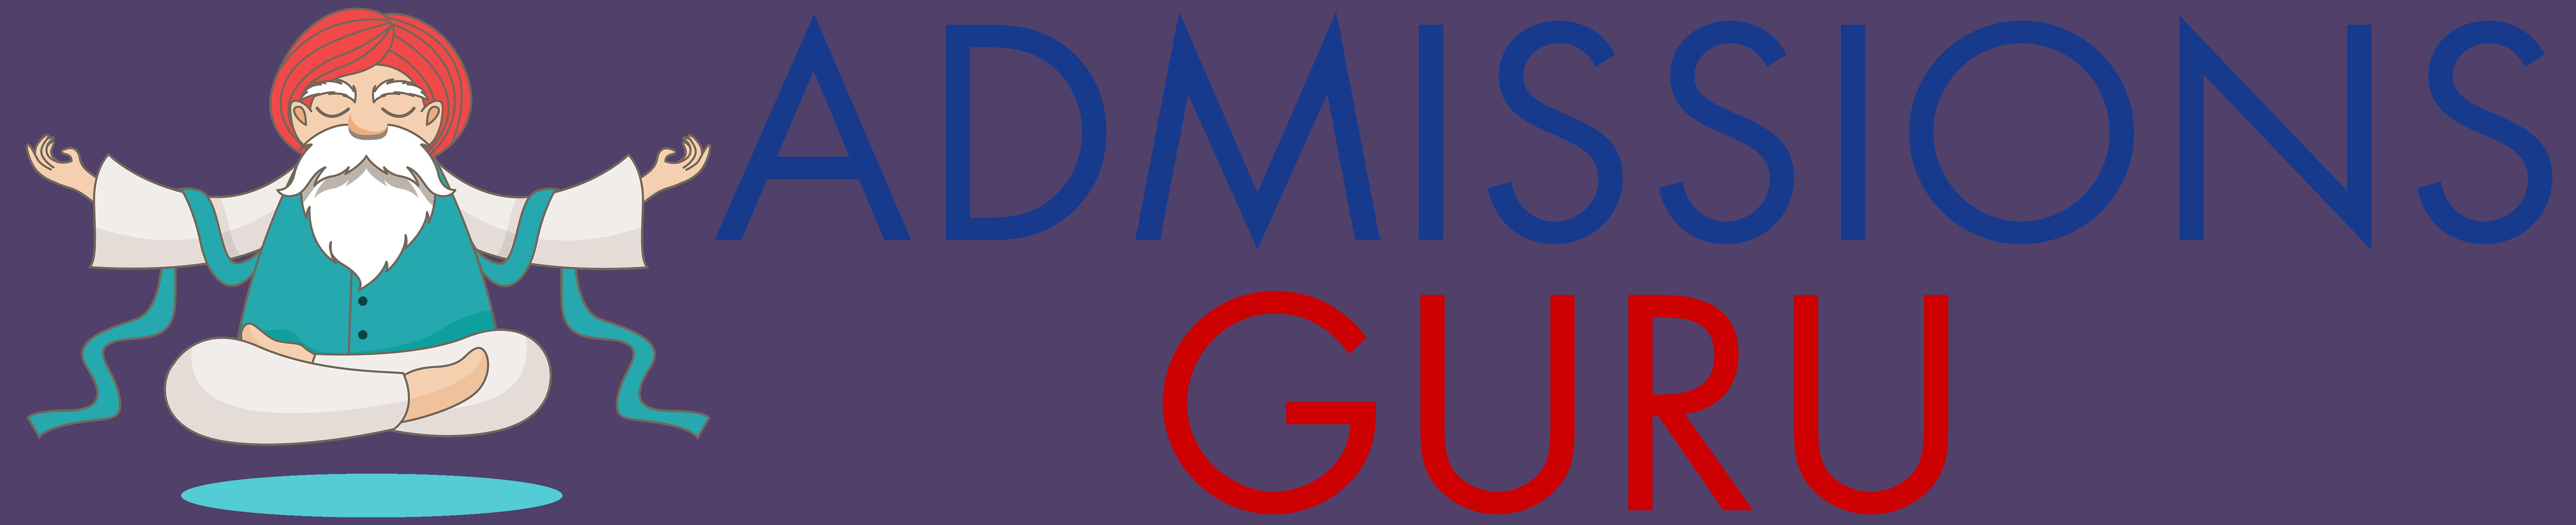 Admissions Guru